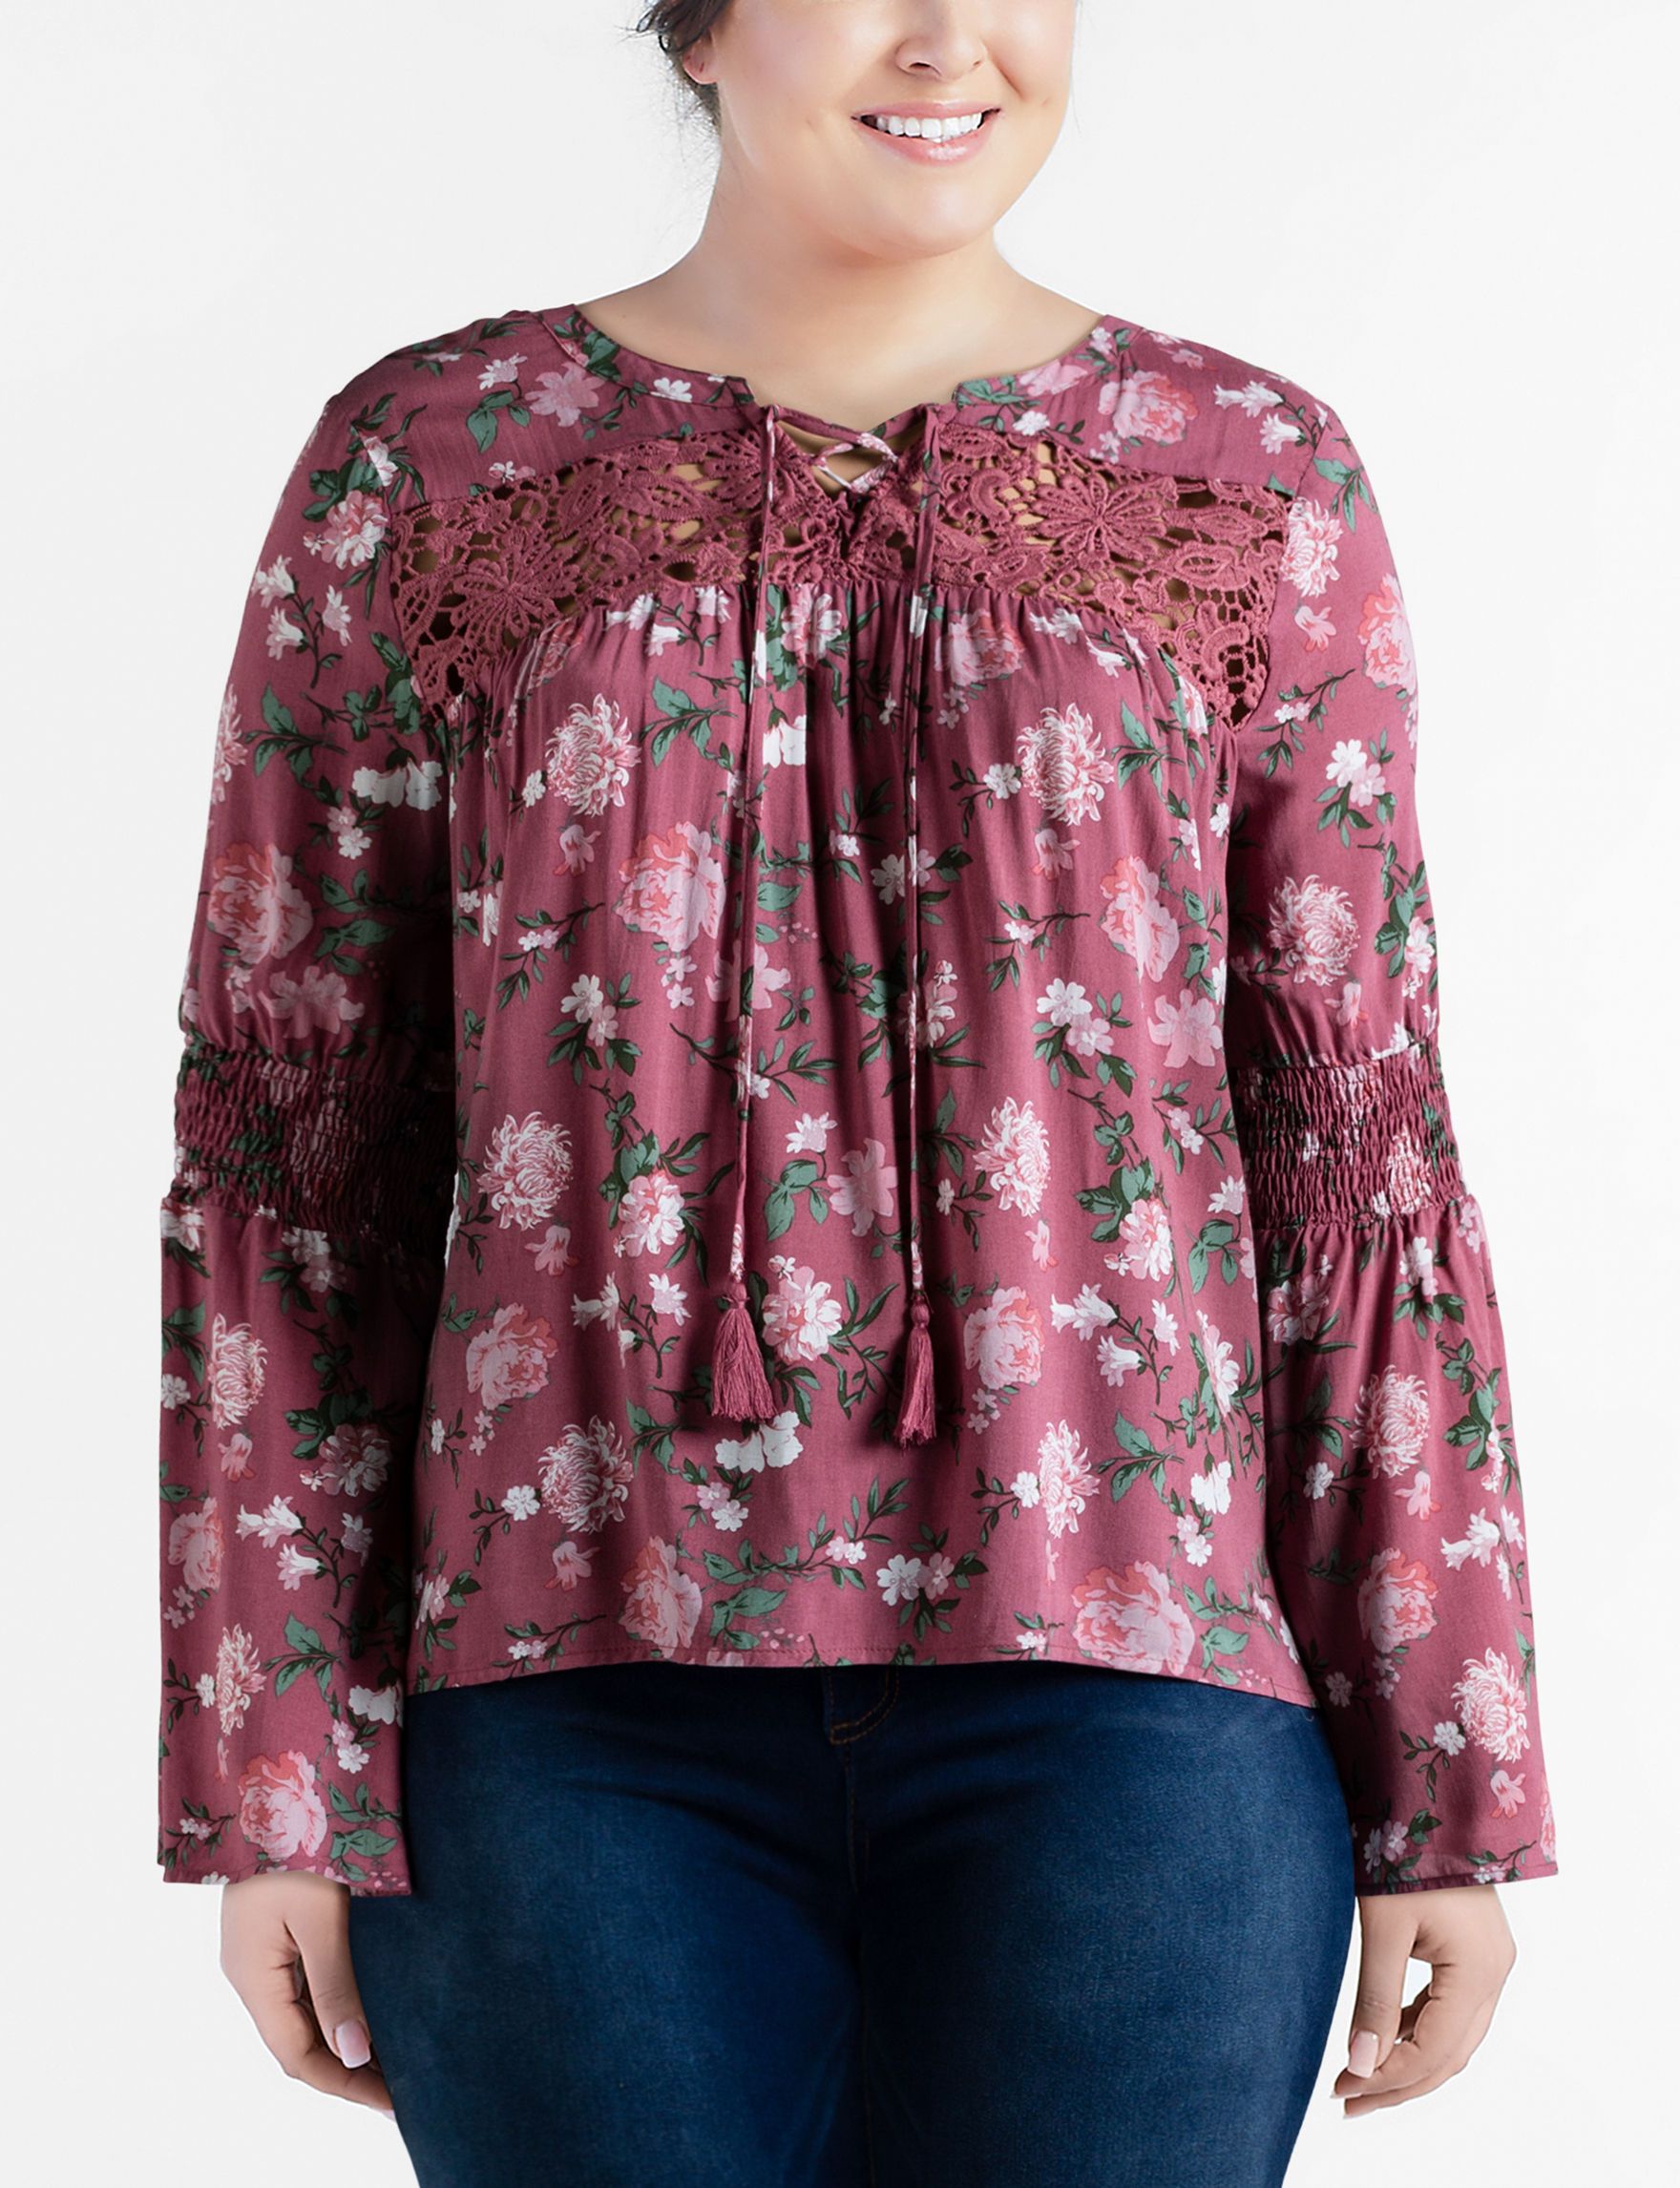 Moral Fiber Pink Multi Shirts & Blouses